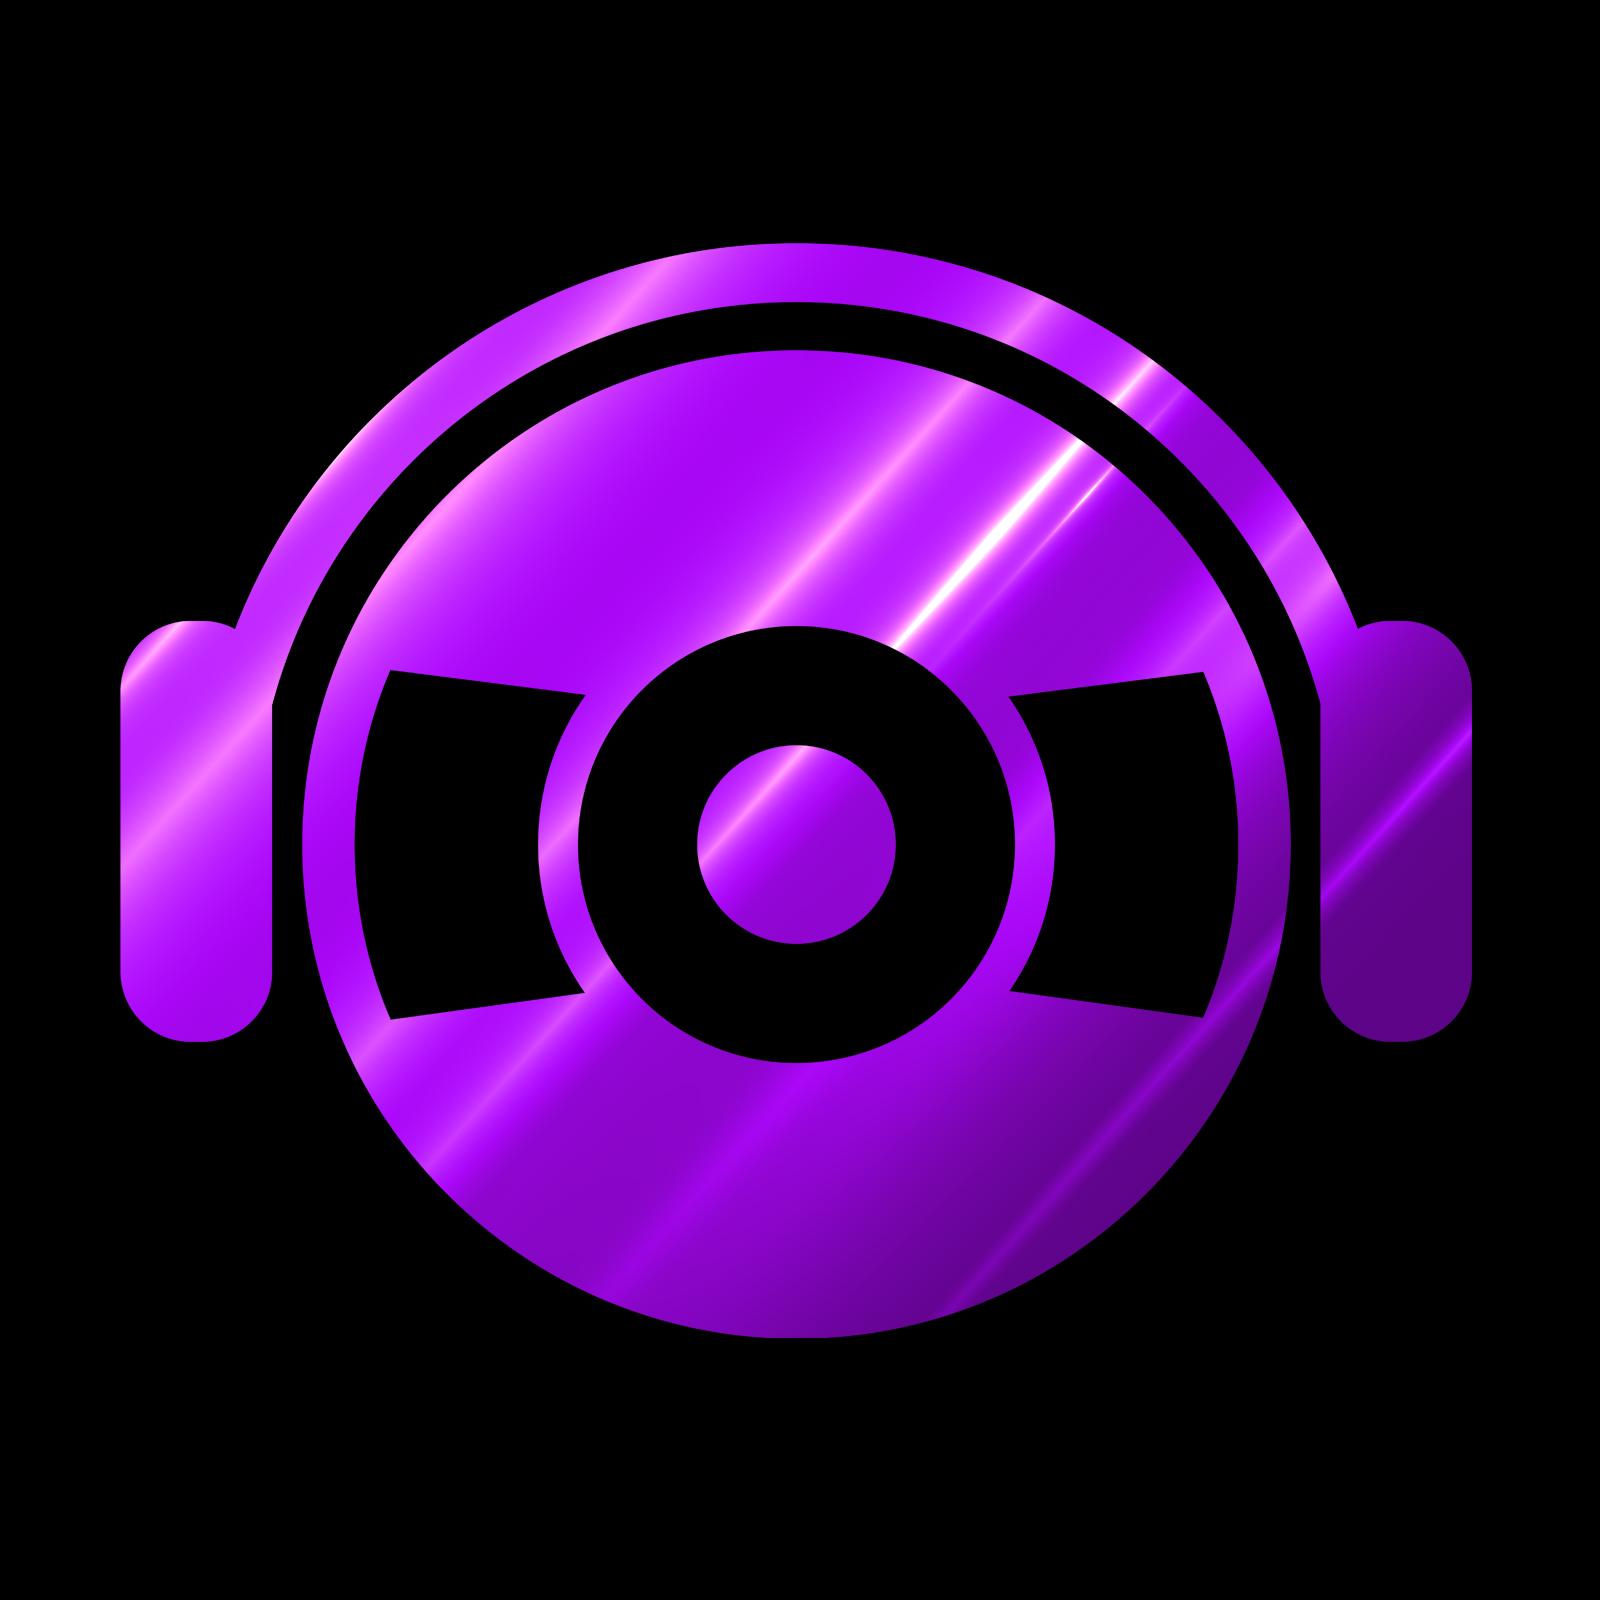 Purplehed